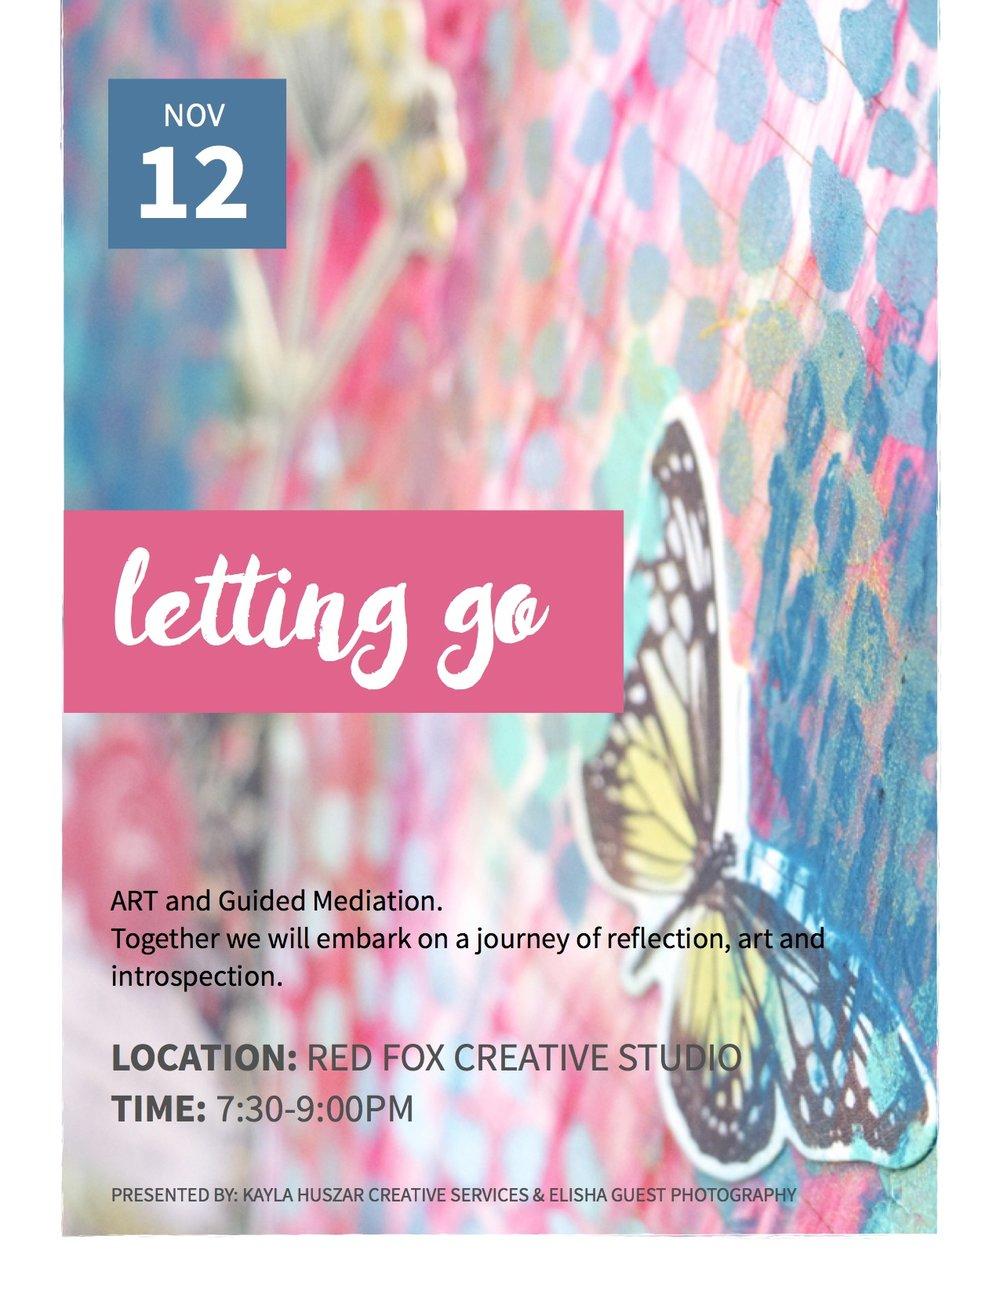 Regina-Womens-Event-LETTING GO-poster.jpg